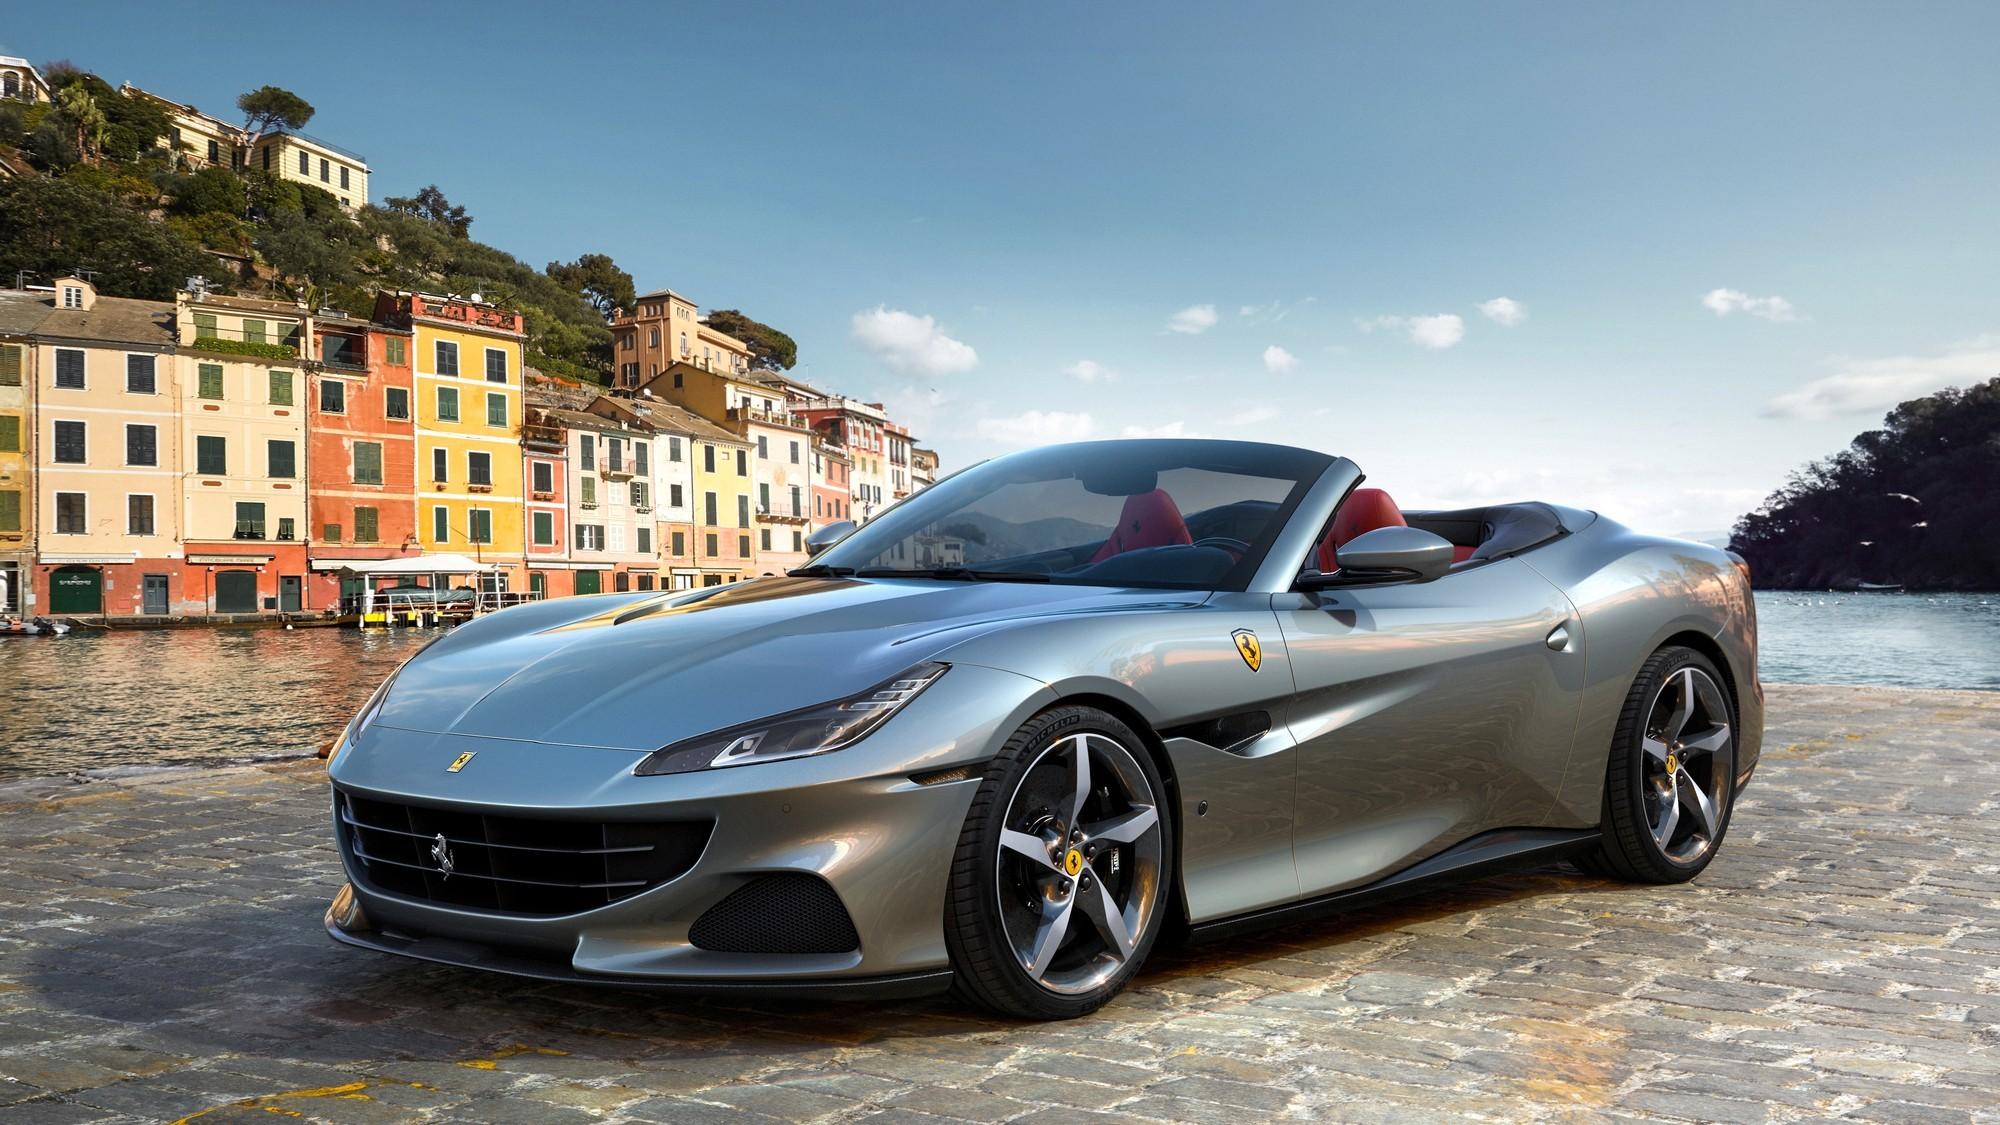 Ferrari Portofino M: старый дизайн, новая электроника и силовой агрегат от Roma